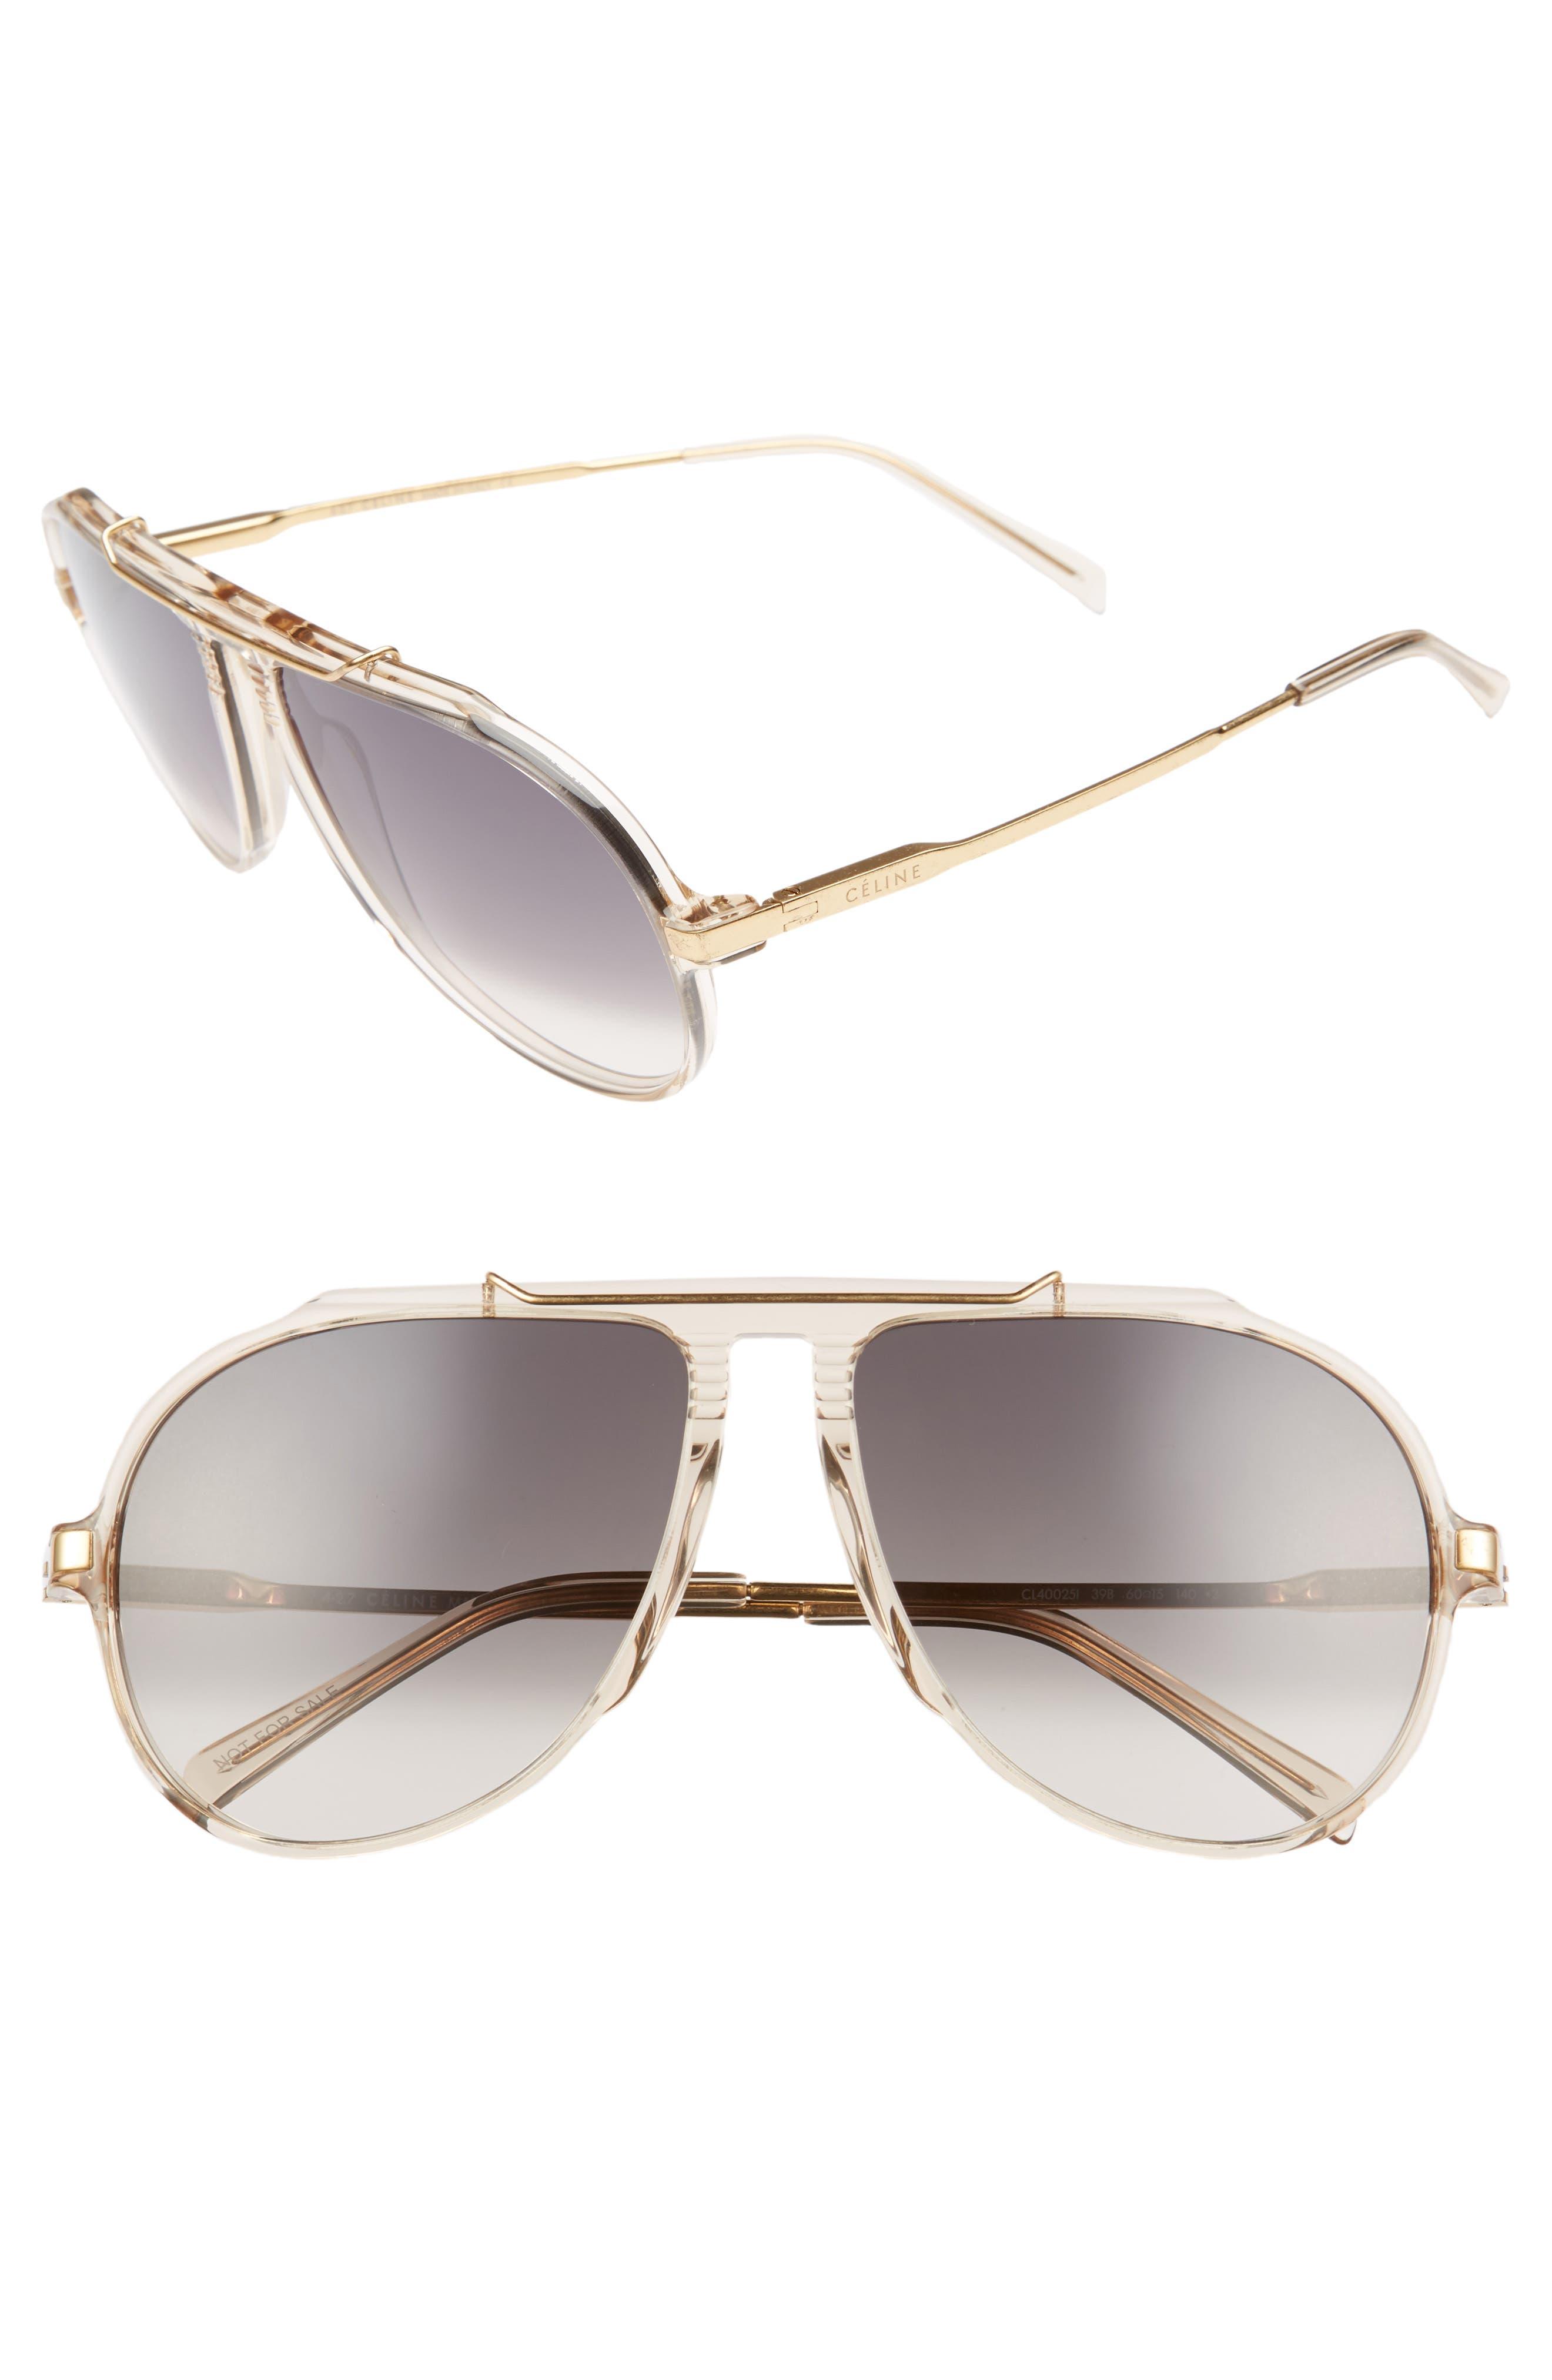 Main Image - Céline 60mm Gradient Aviator Sunglasses